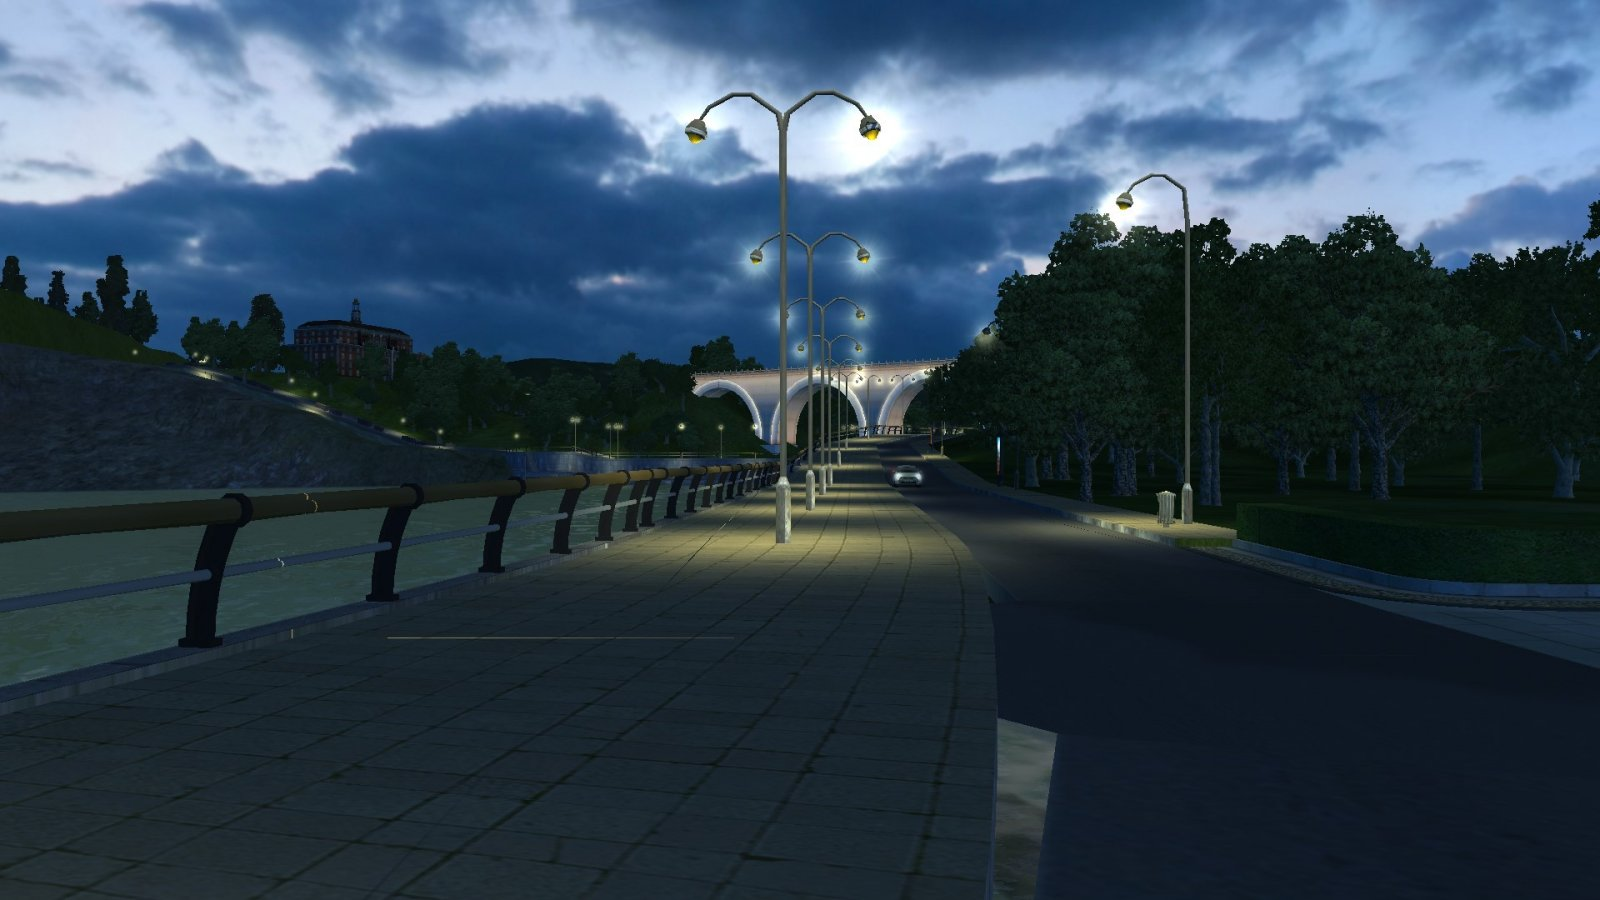 08_04 Lovers Bridge at Night.jpg